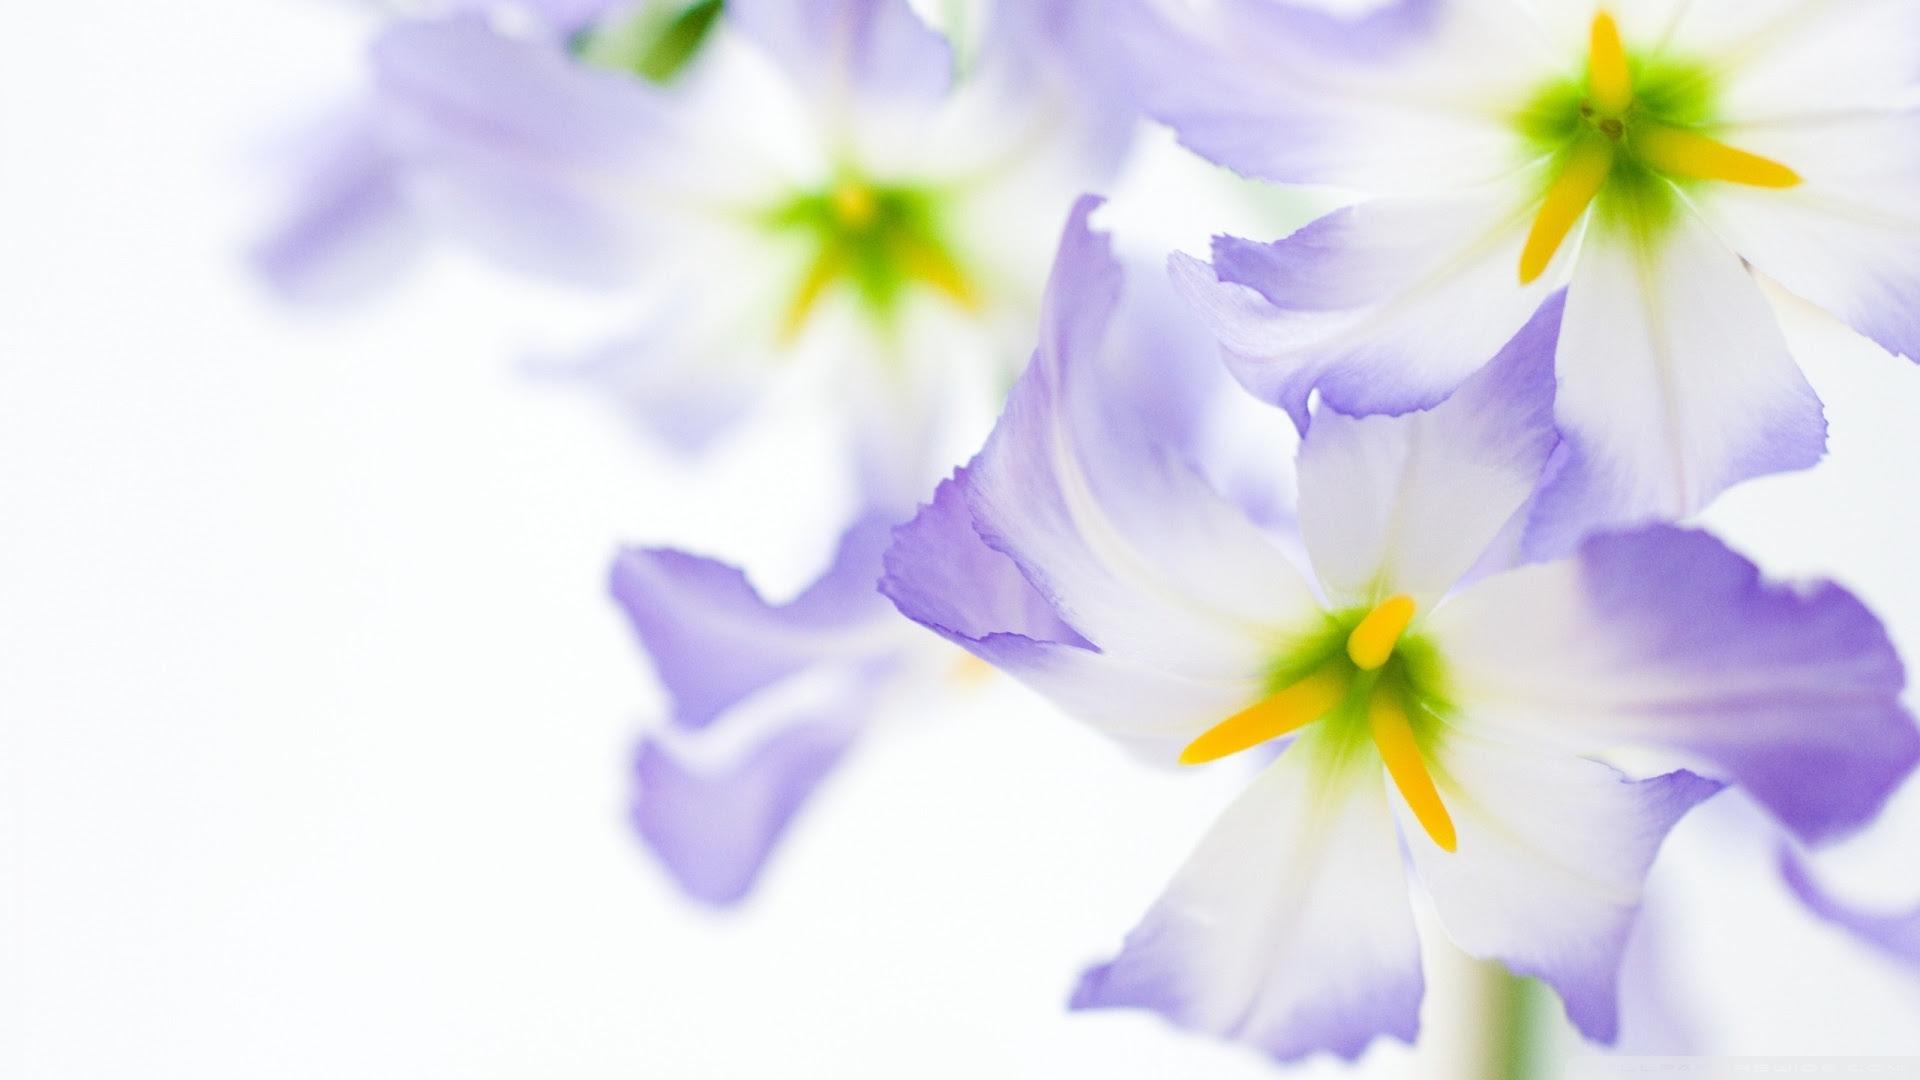 Flowers On White Background Ultra Hd Desktop Background Wallpaper